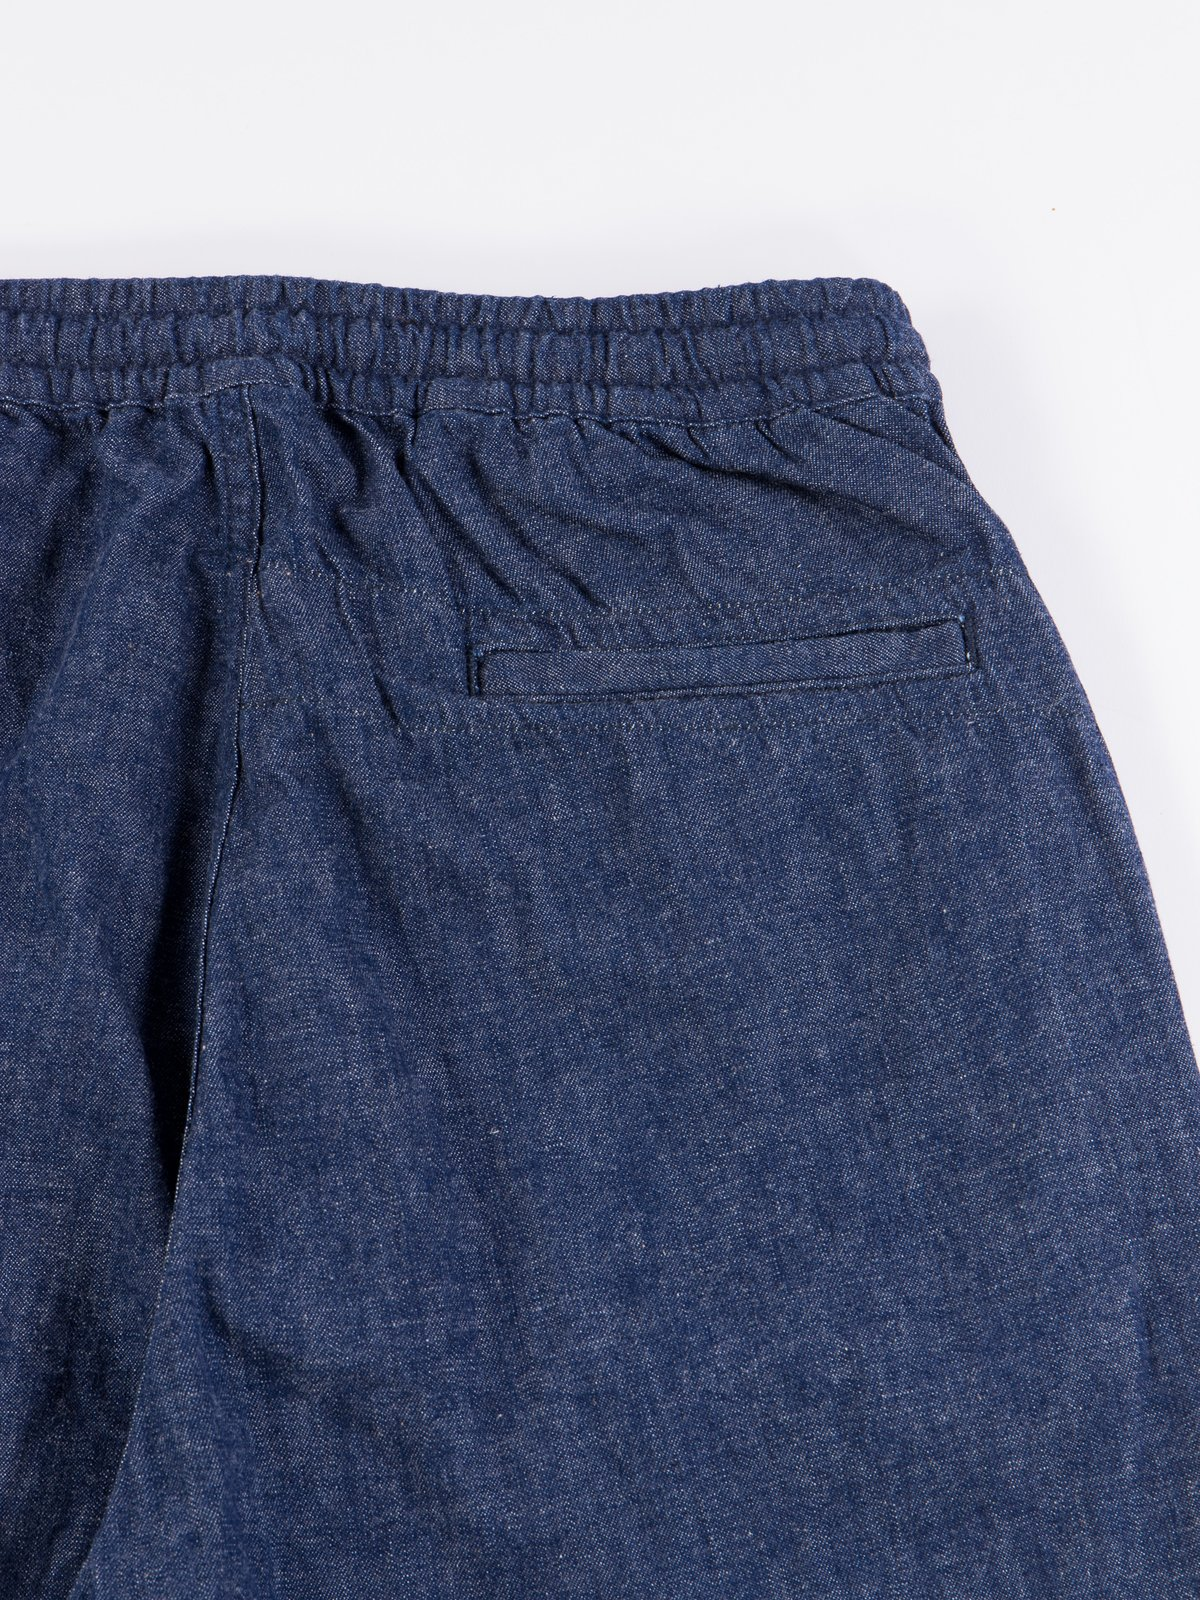 One Wash Denim Takumi Pant - Image 4